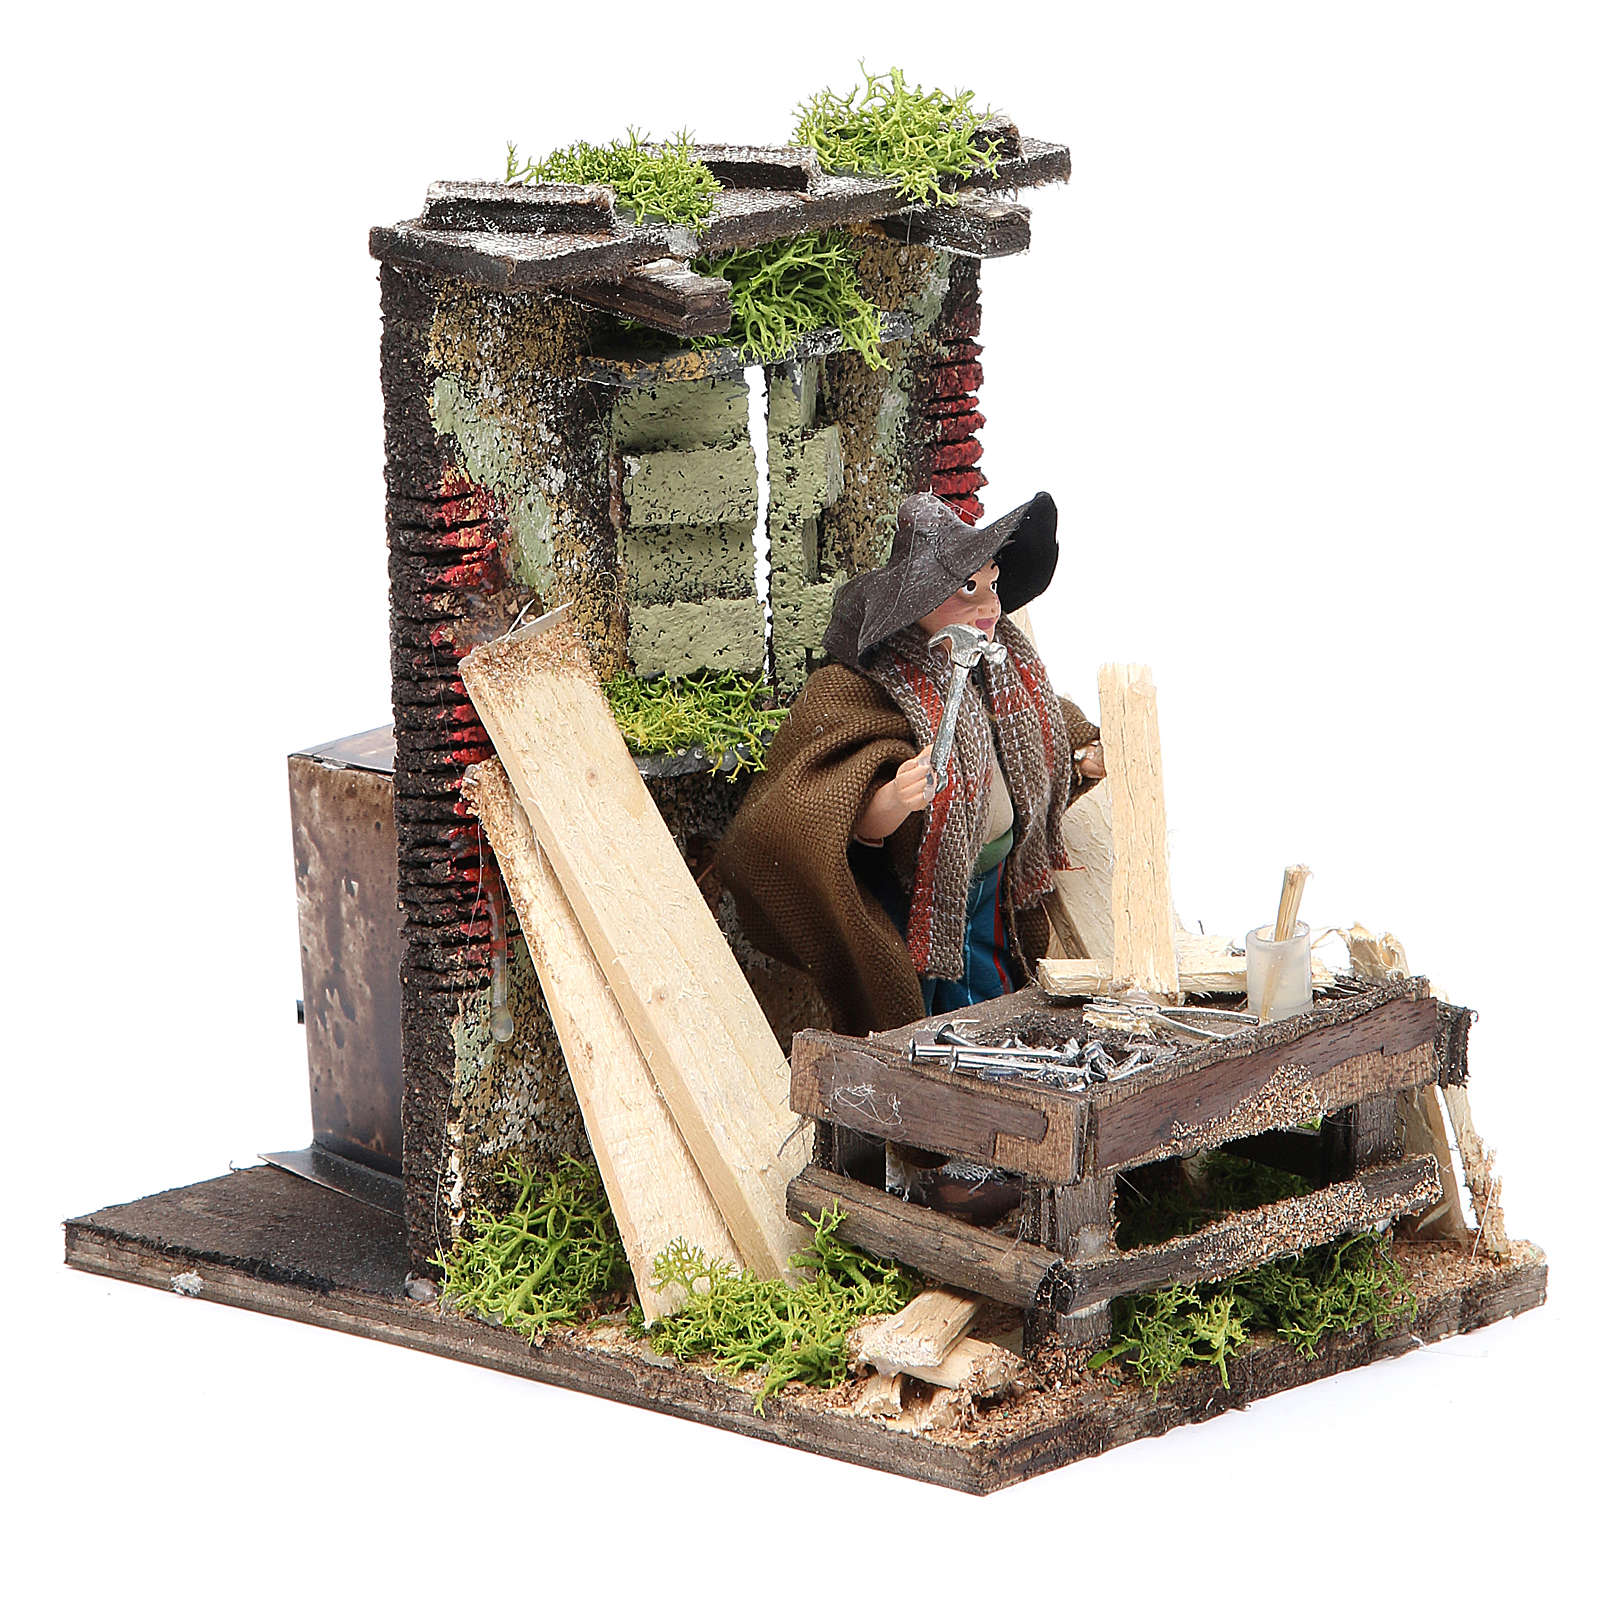 Carpenter animated figurine for Neapolitan Nativity, 10cm 4